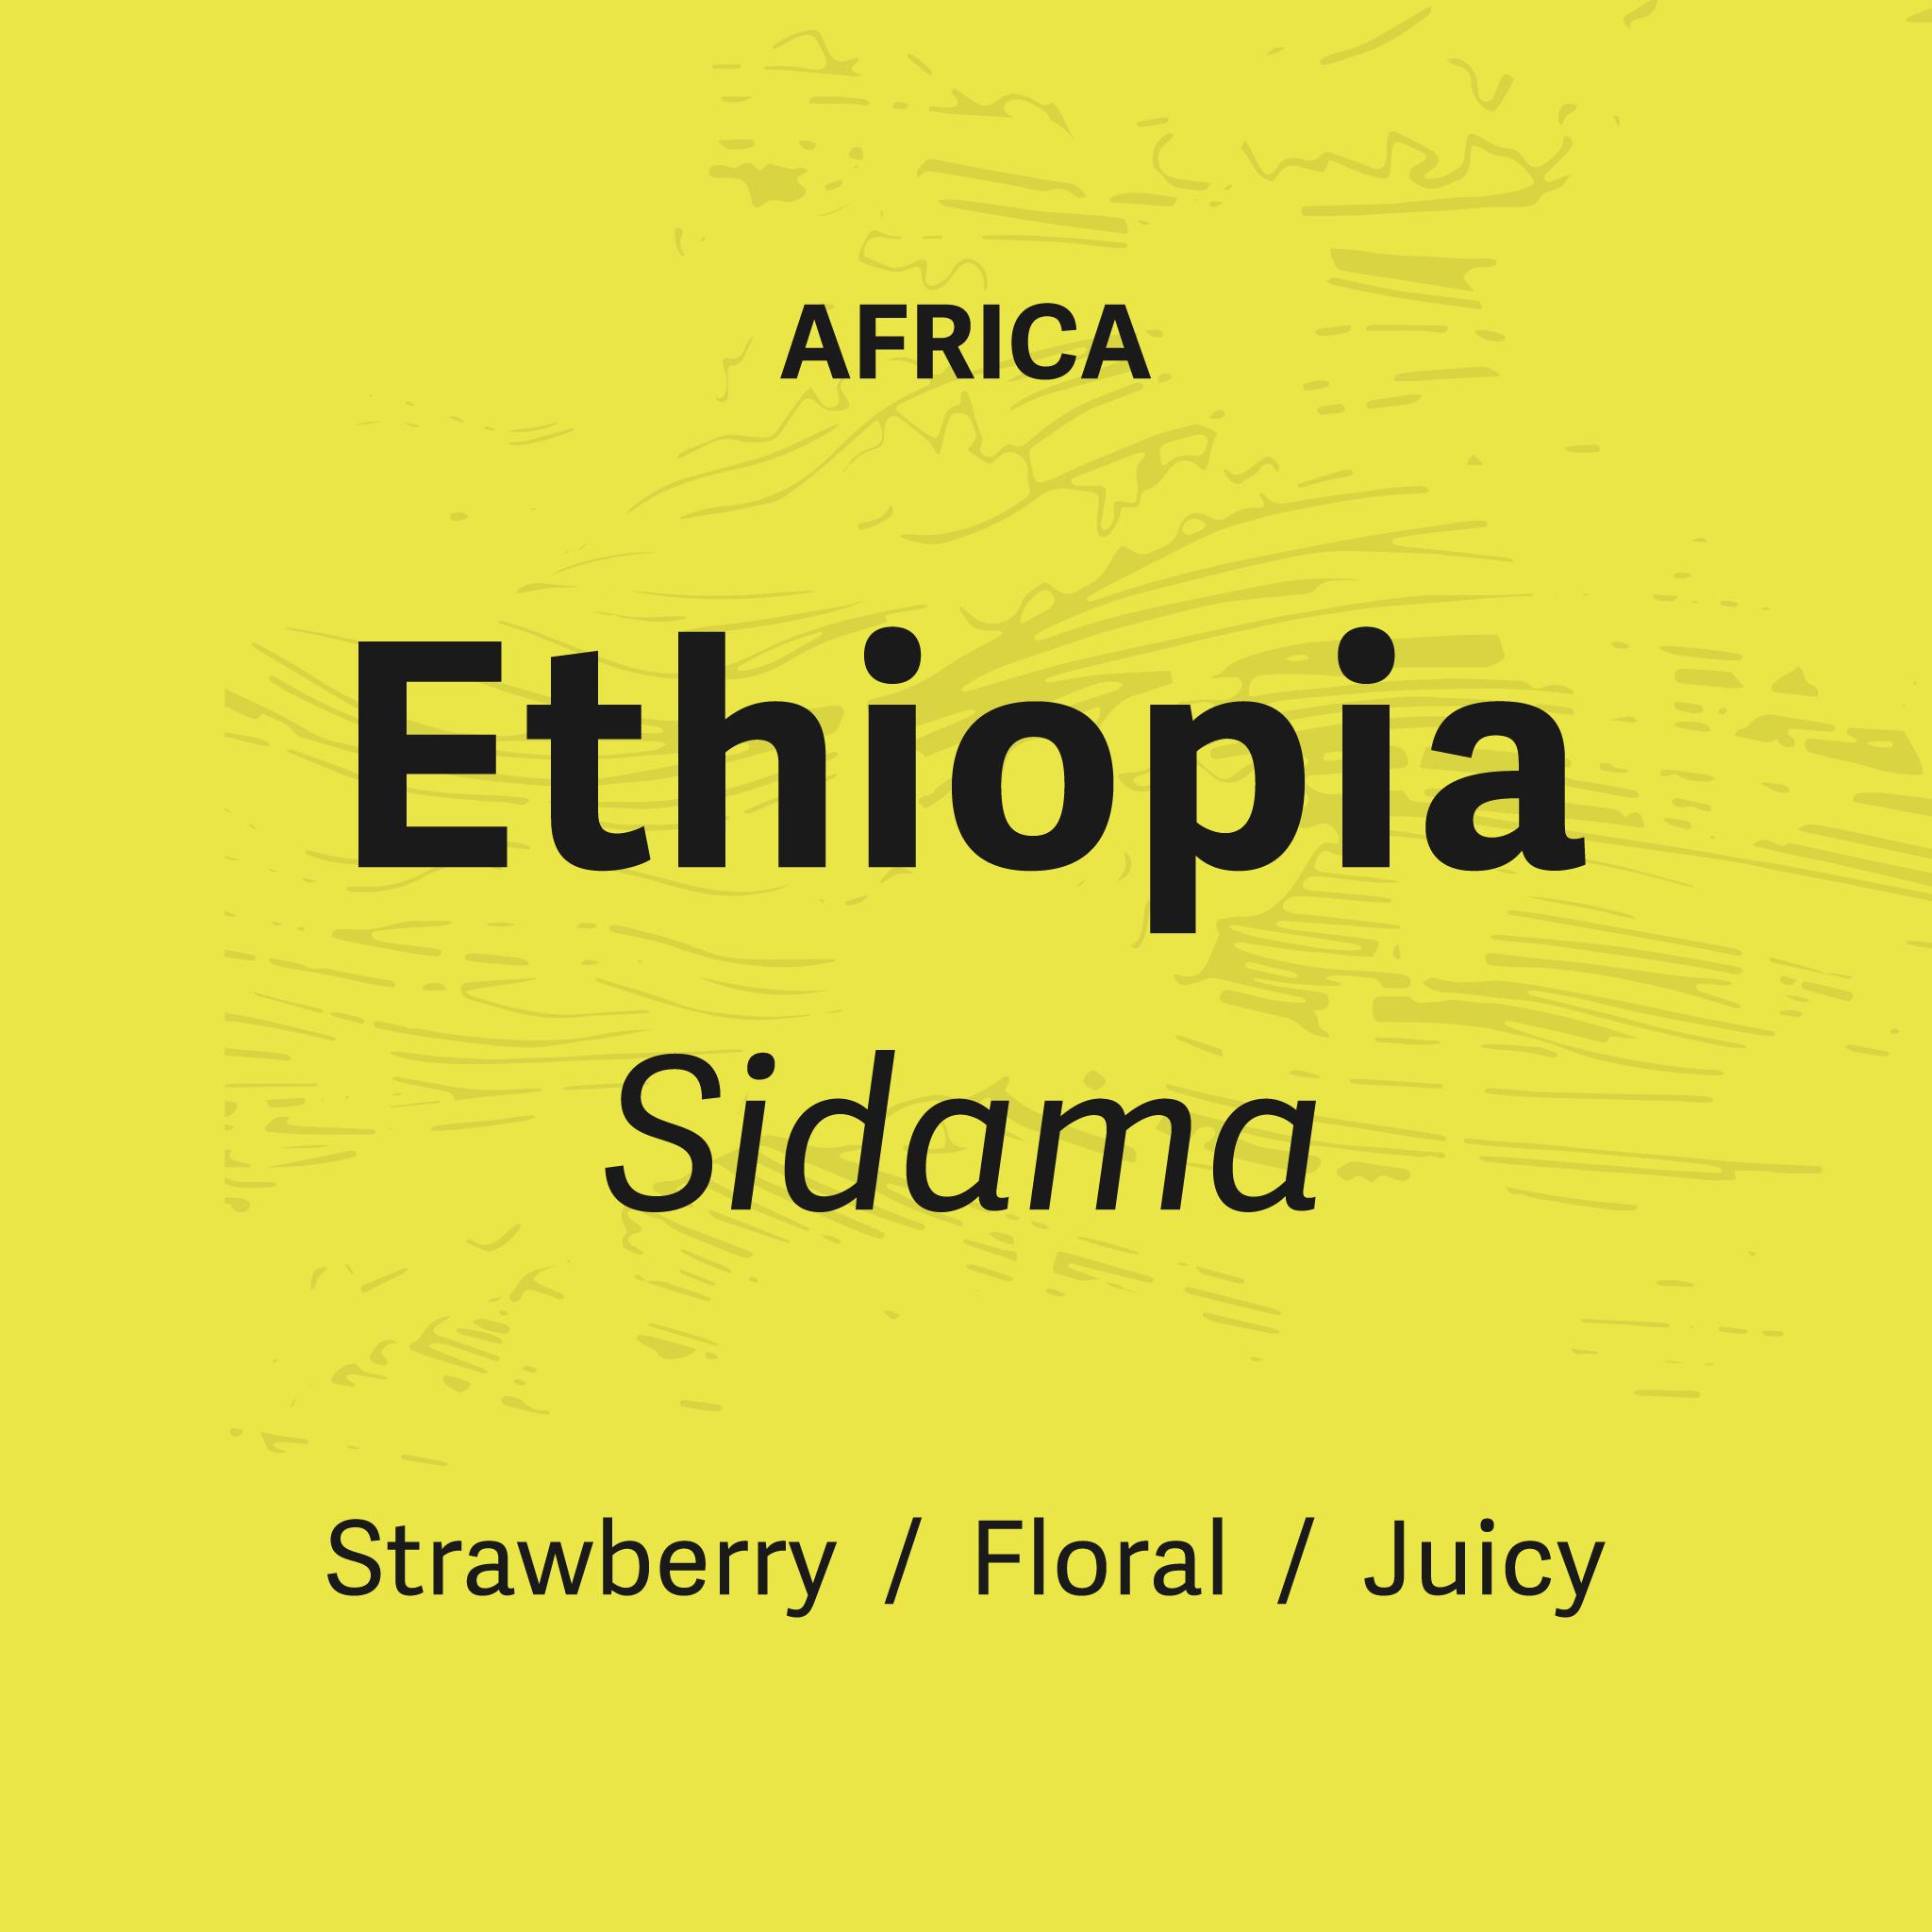 Boil Line Coffee Co Ethiopia Sidama